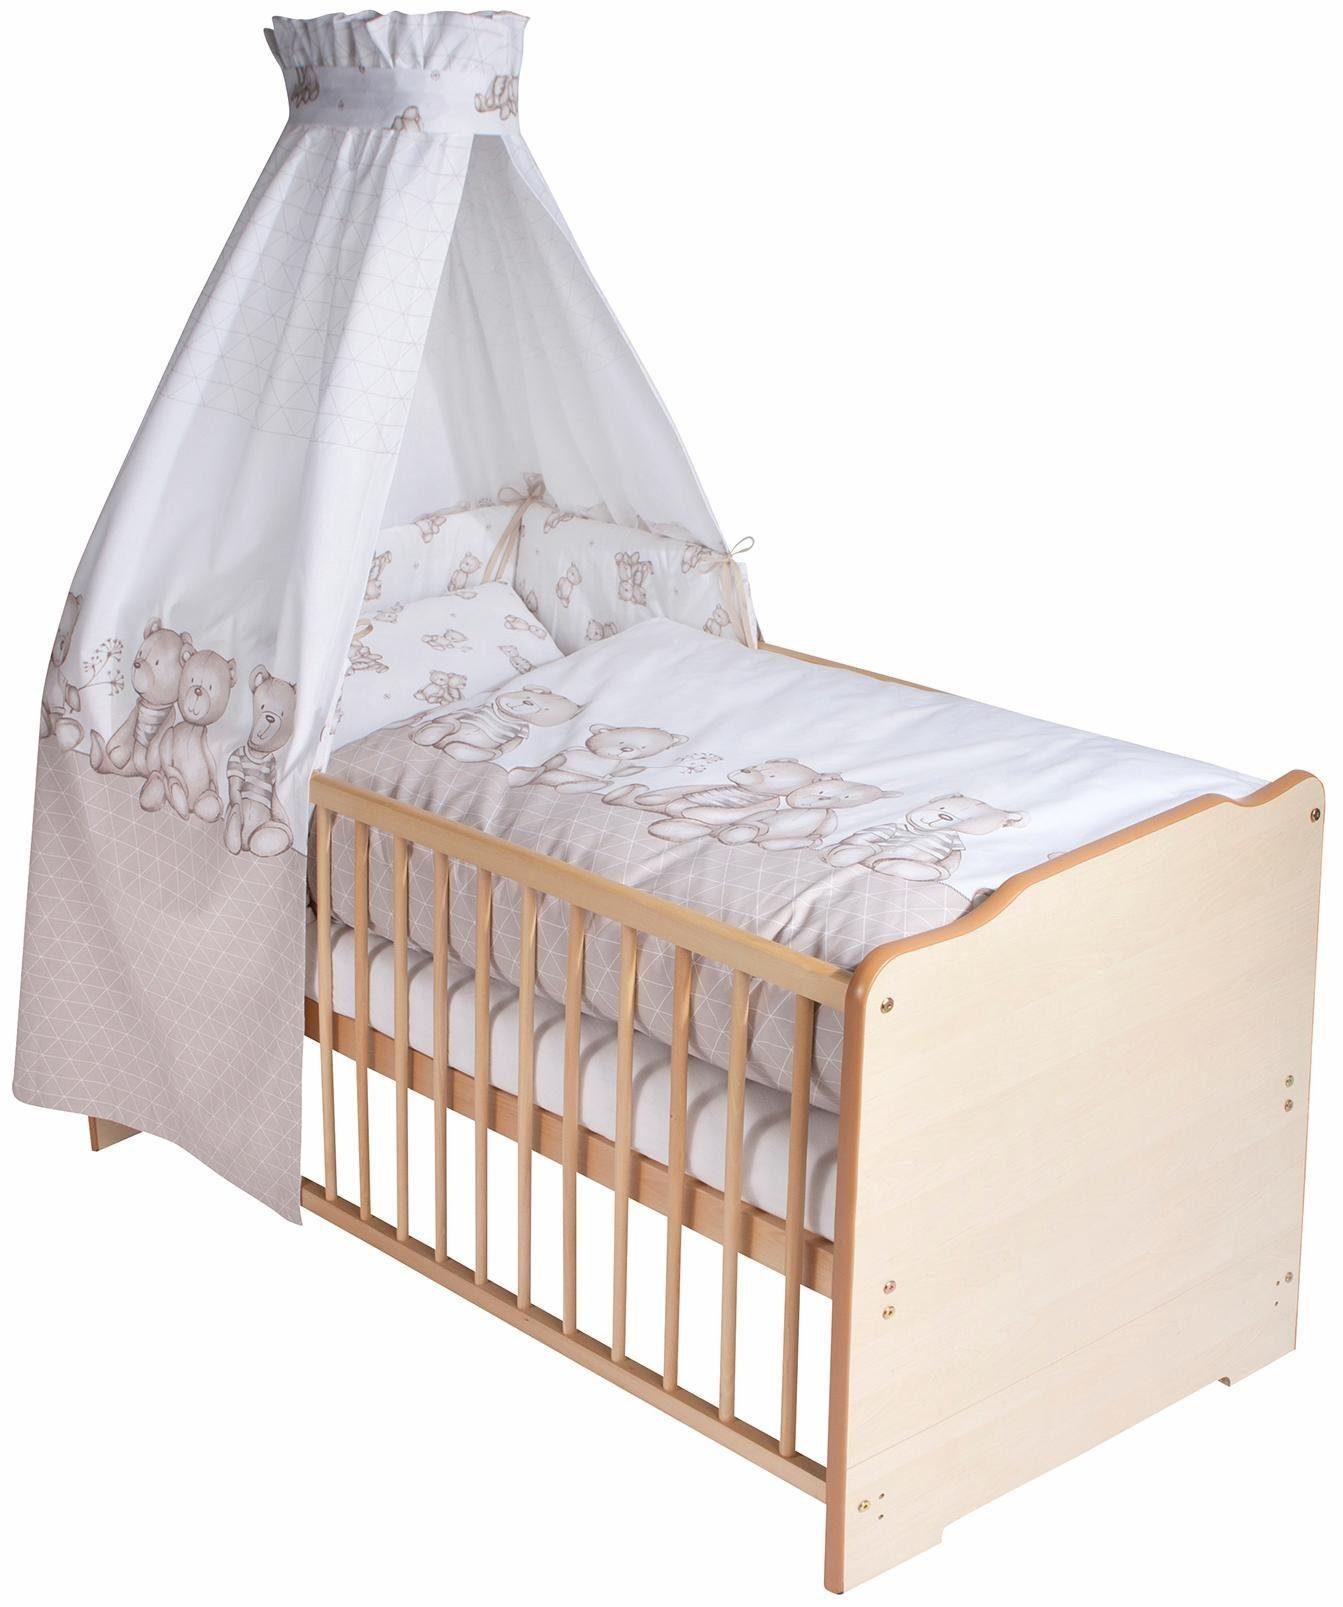 Zöllner 7-tlg. Komplettbett, Babybett+ Matratze+ Himmelstange+ Himmel+ Nestchen+ Bettwäsche